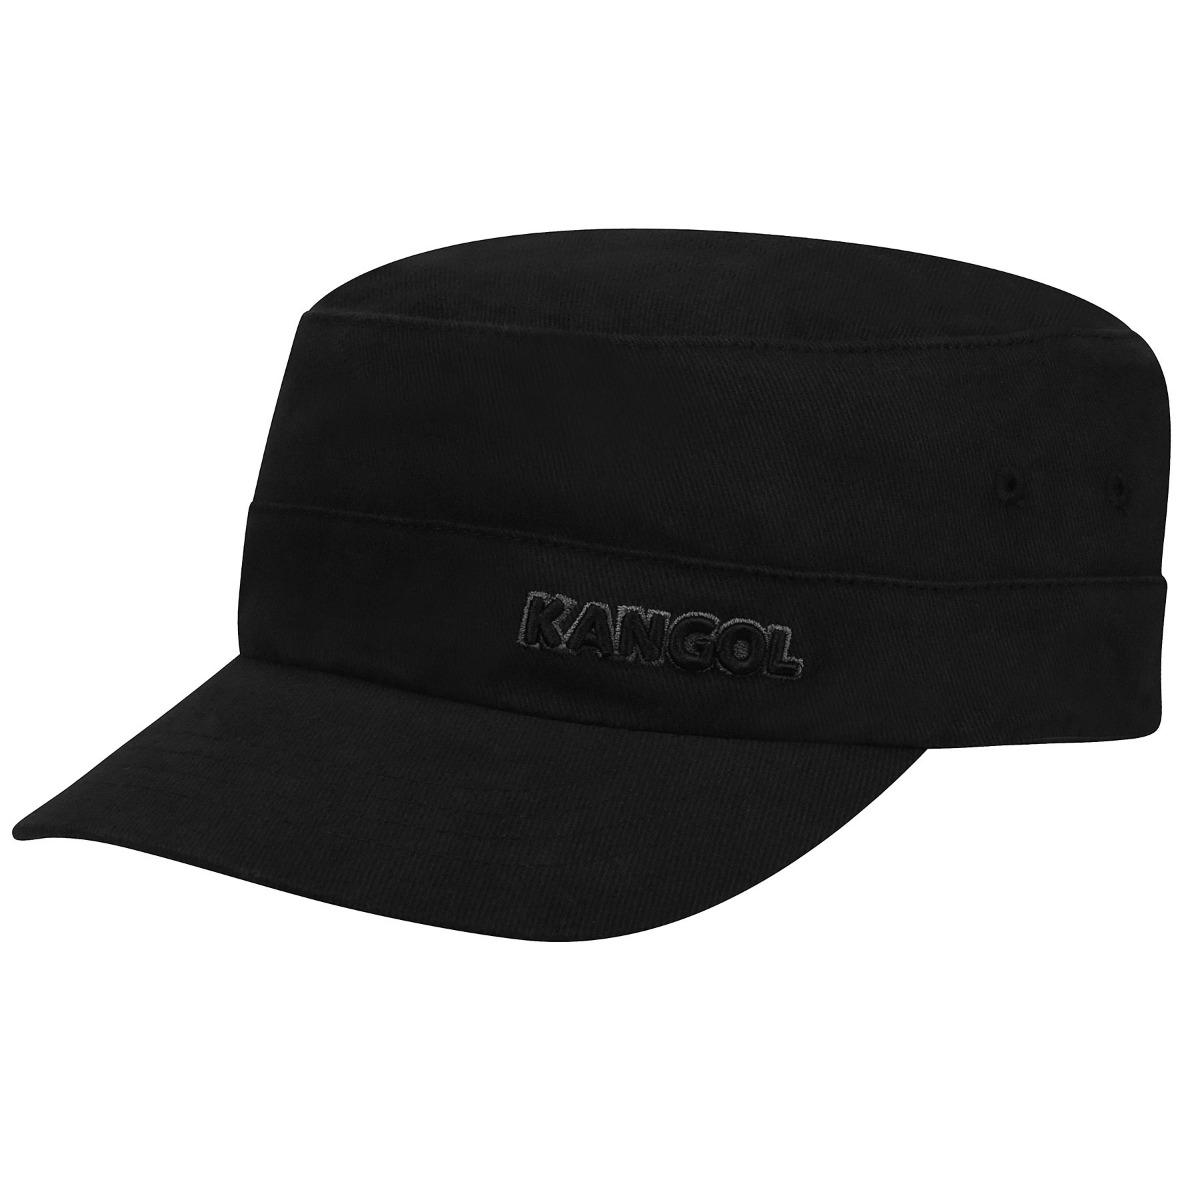 Kangol Cotton Twill Army Cap in Black